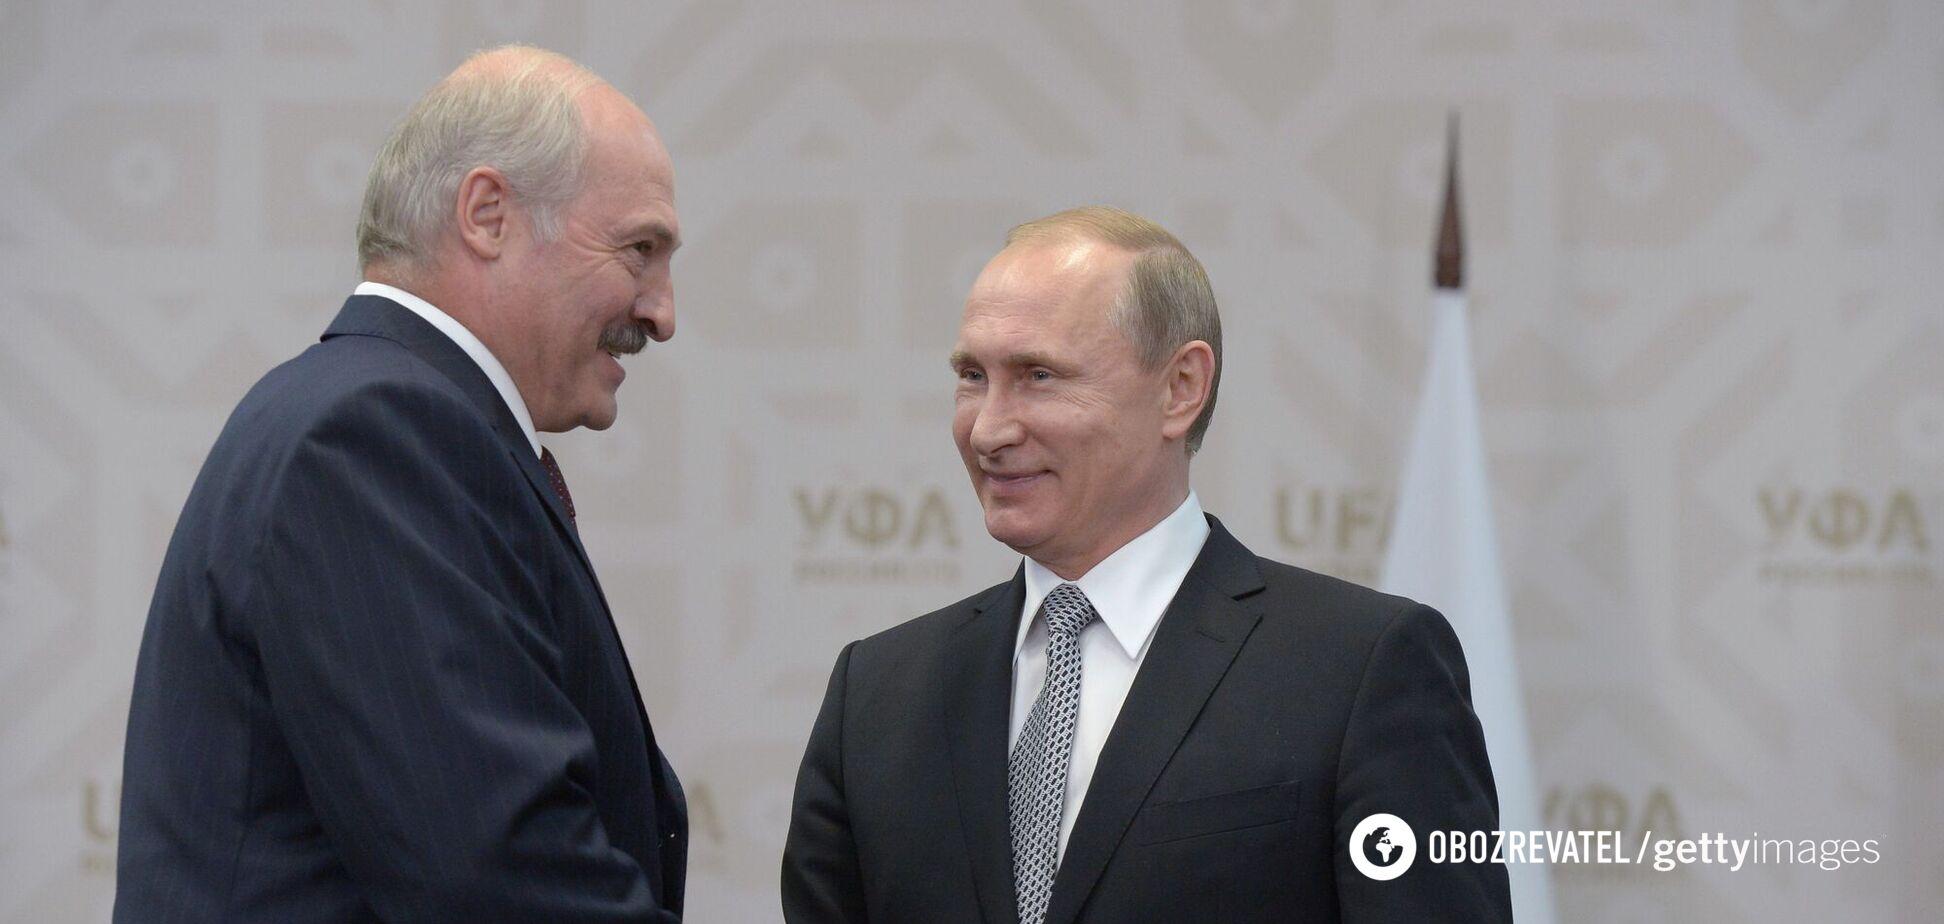 Путин и Лукашенко регулярно обсуждают ситуацию в Беларуси